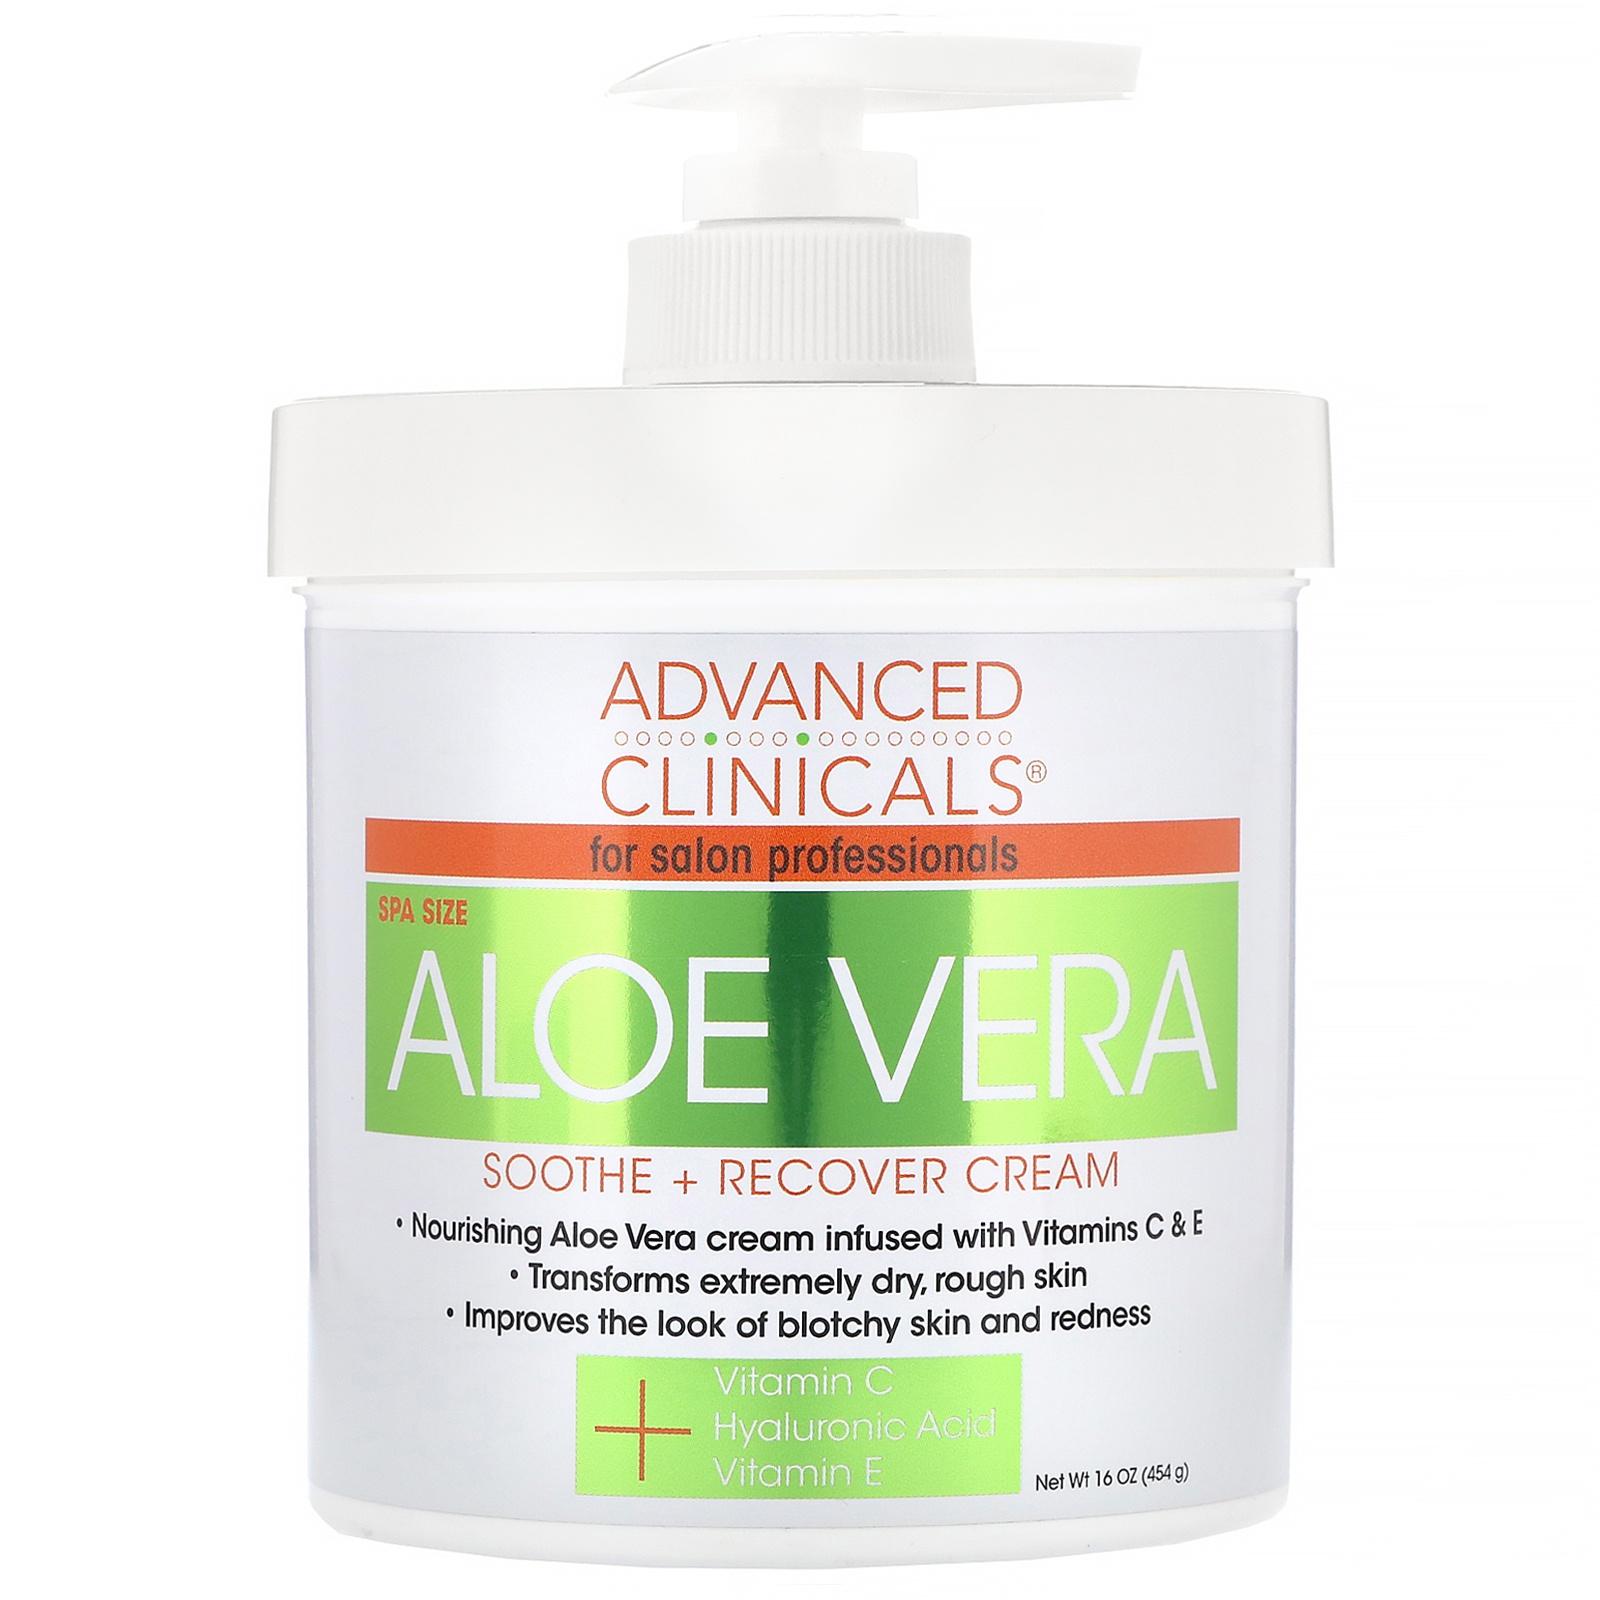 Advanced Clinicals Aloe Vera Shoothe Recovery Cream